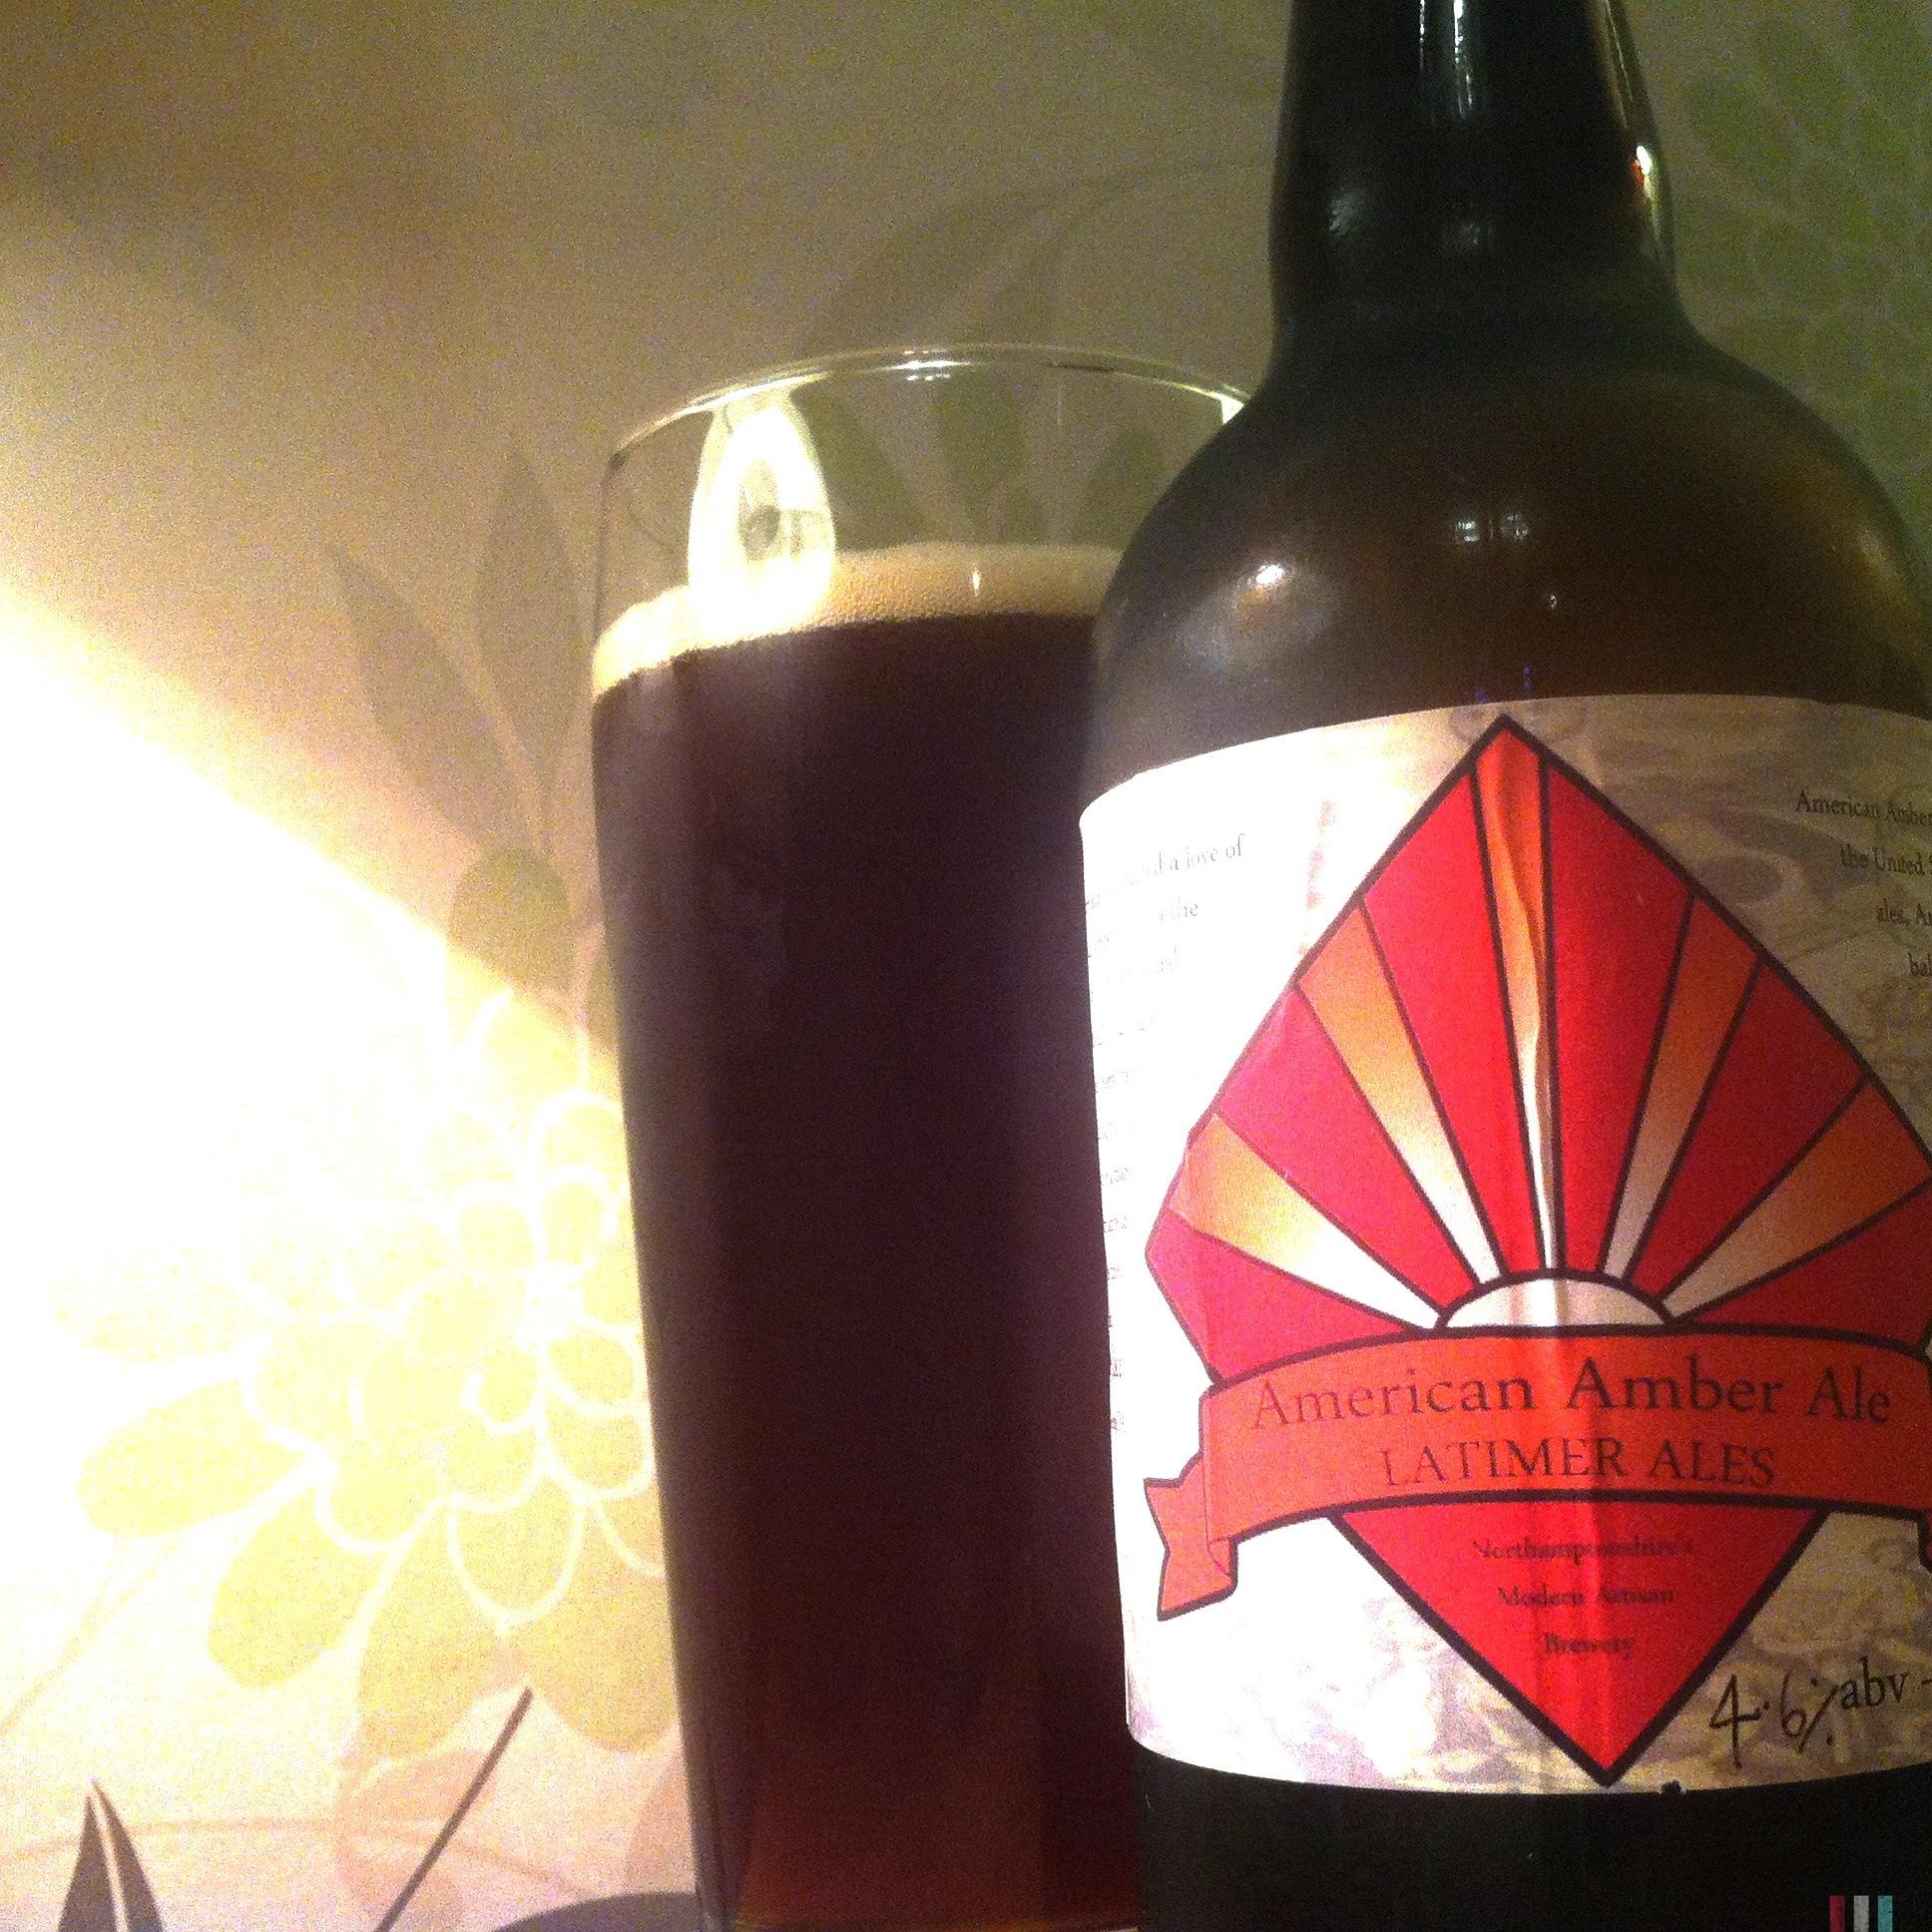 Latimer Ales American Amber Ale (4.6%) | CAMRGB